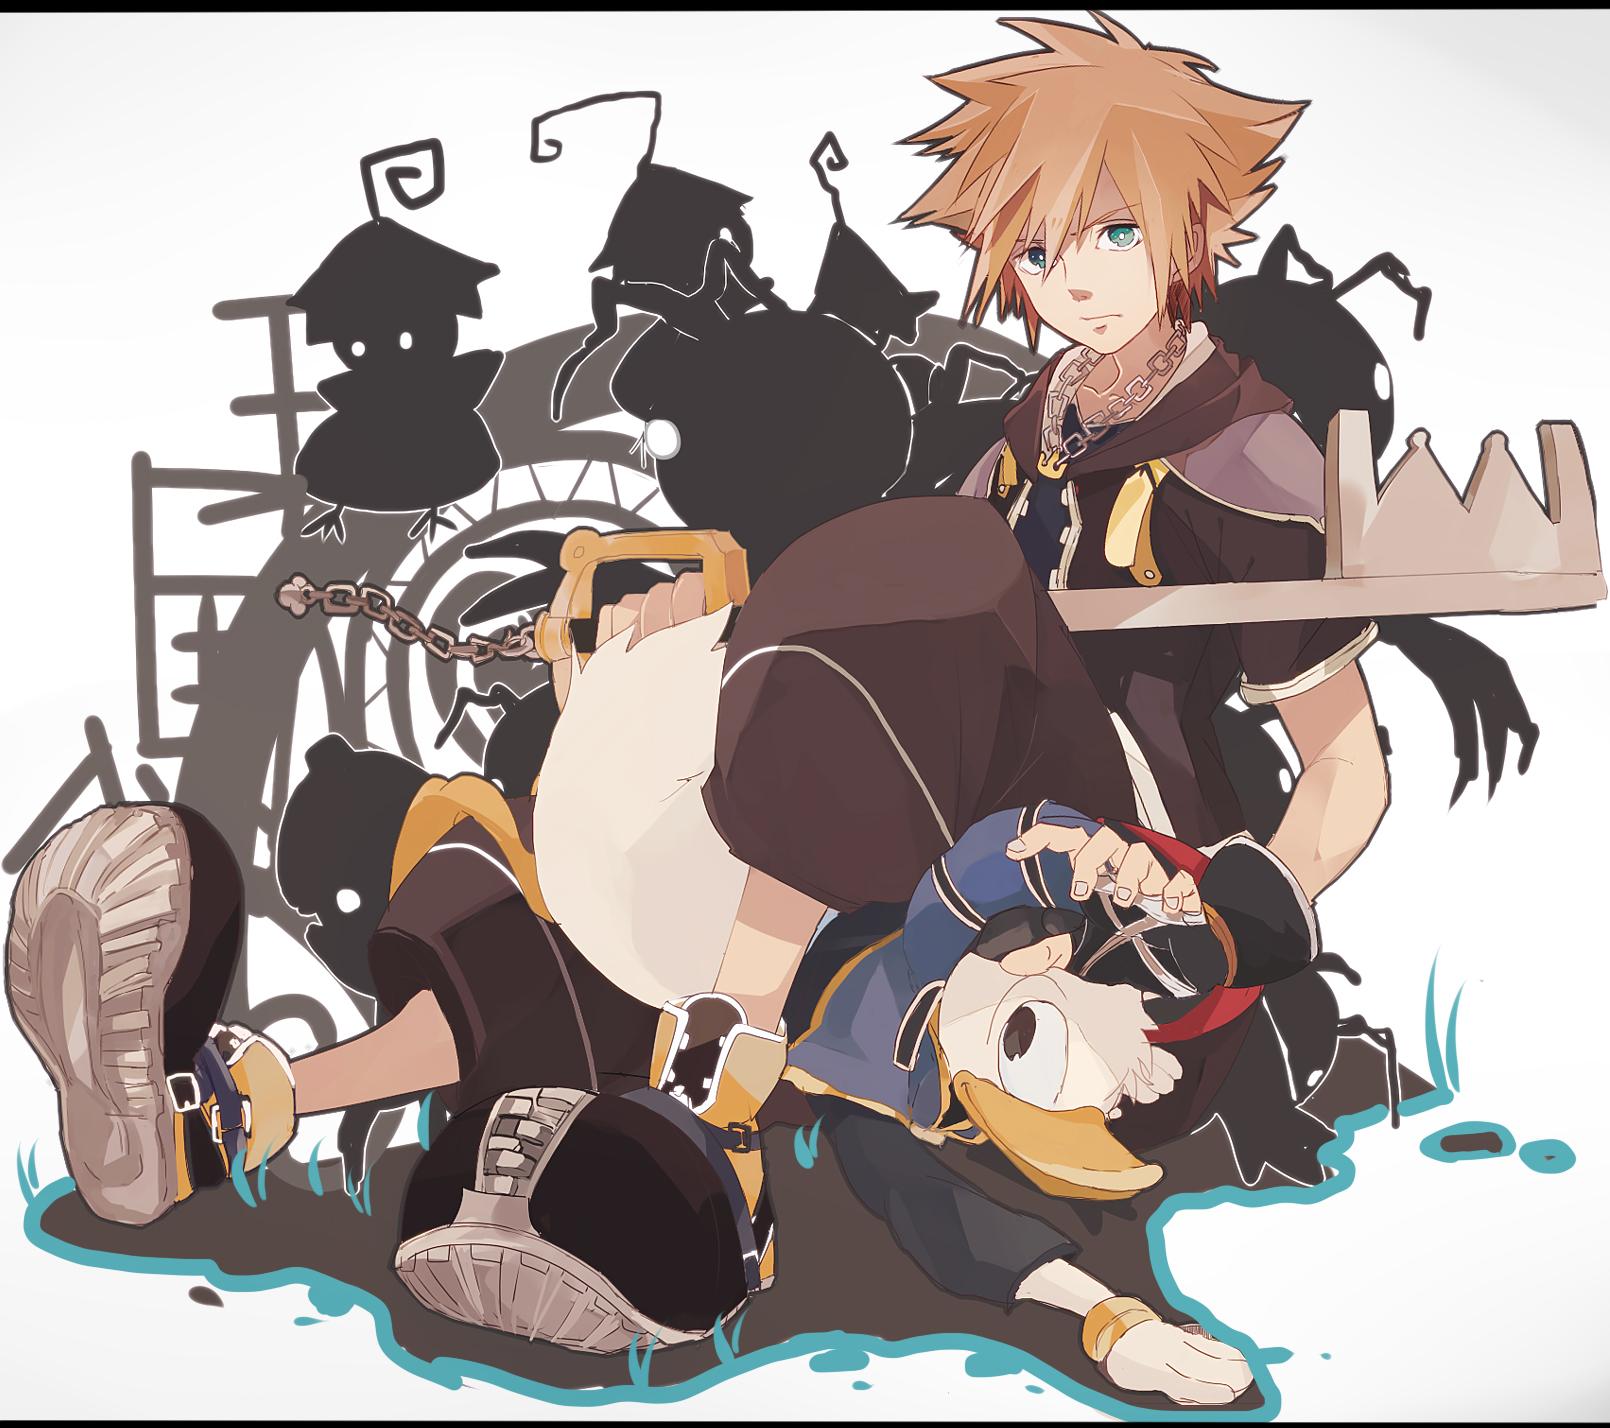 Tags Anime Fanart Kingdom Hearts Sora Pixiv: Kingdom Hearts Image #1258677